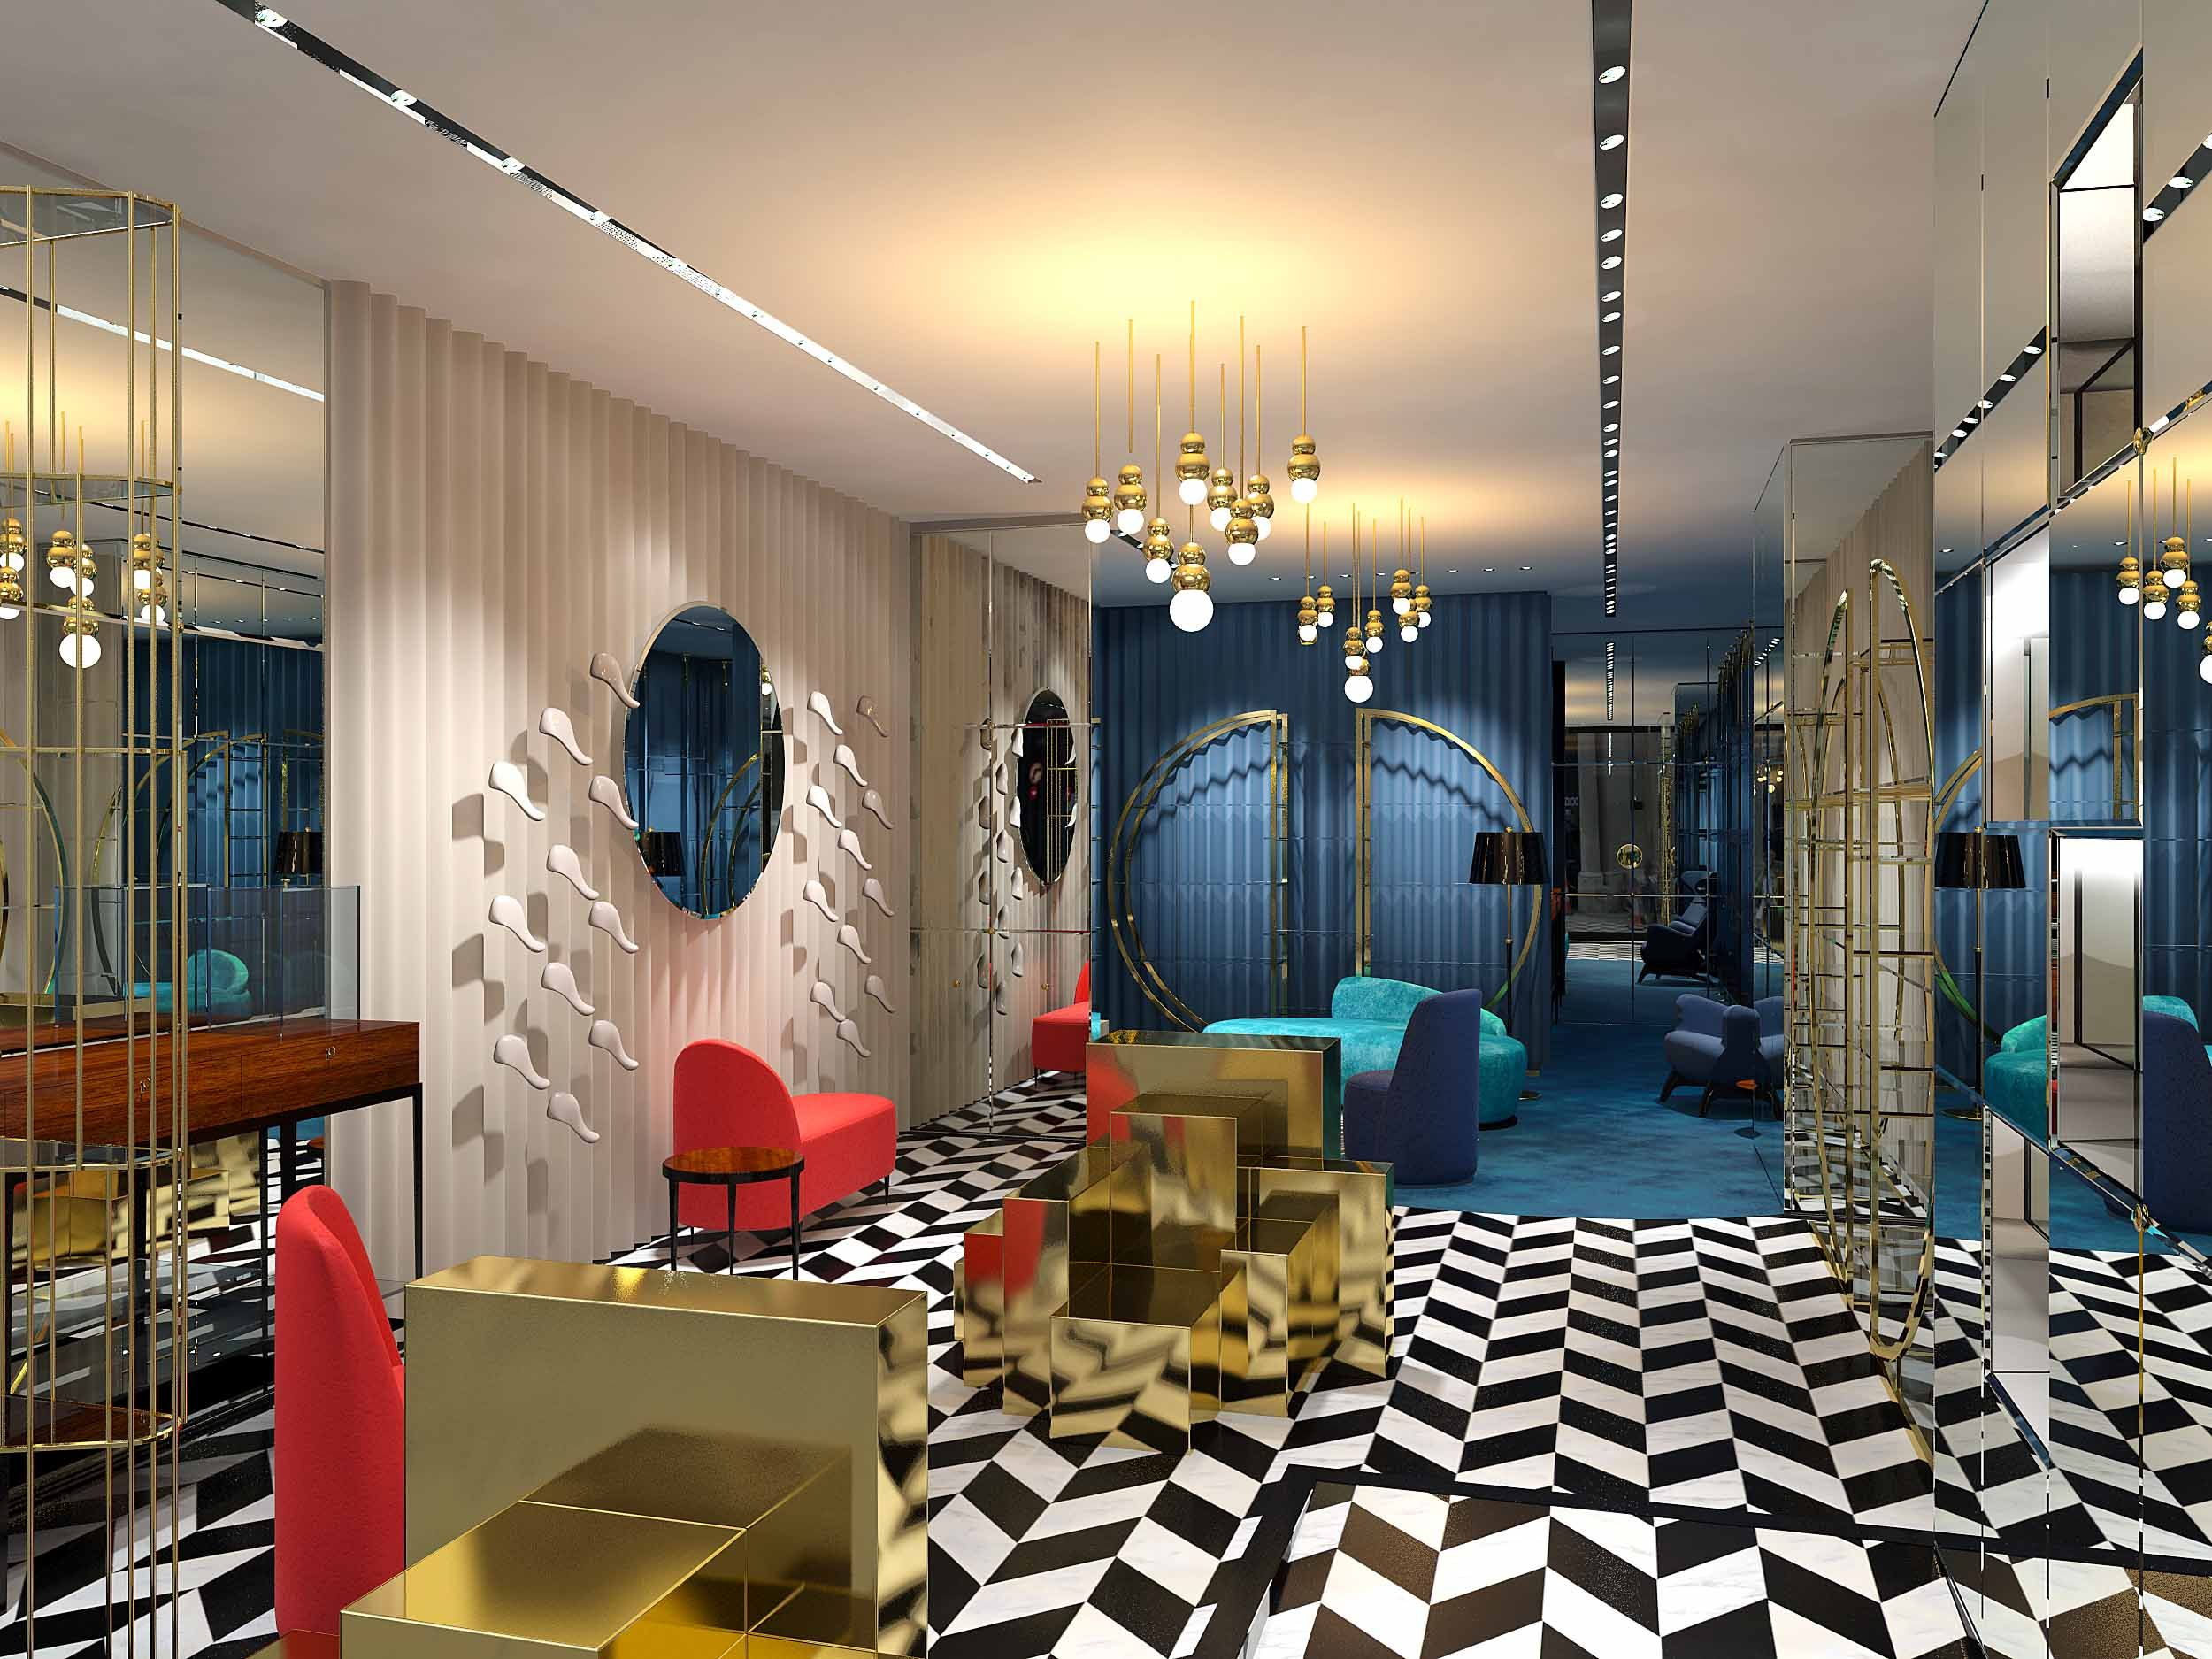 Nouveau Concept Store Paris #2: SERGIO ROSSI Inaugure Un Nouveau Concept Store à Londres